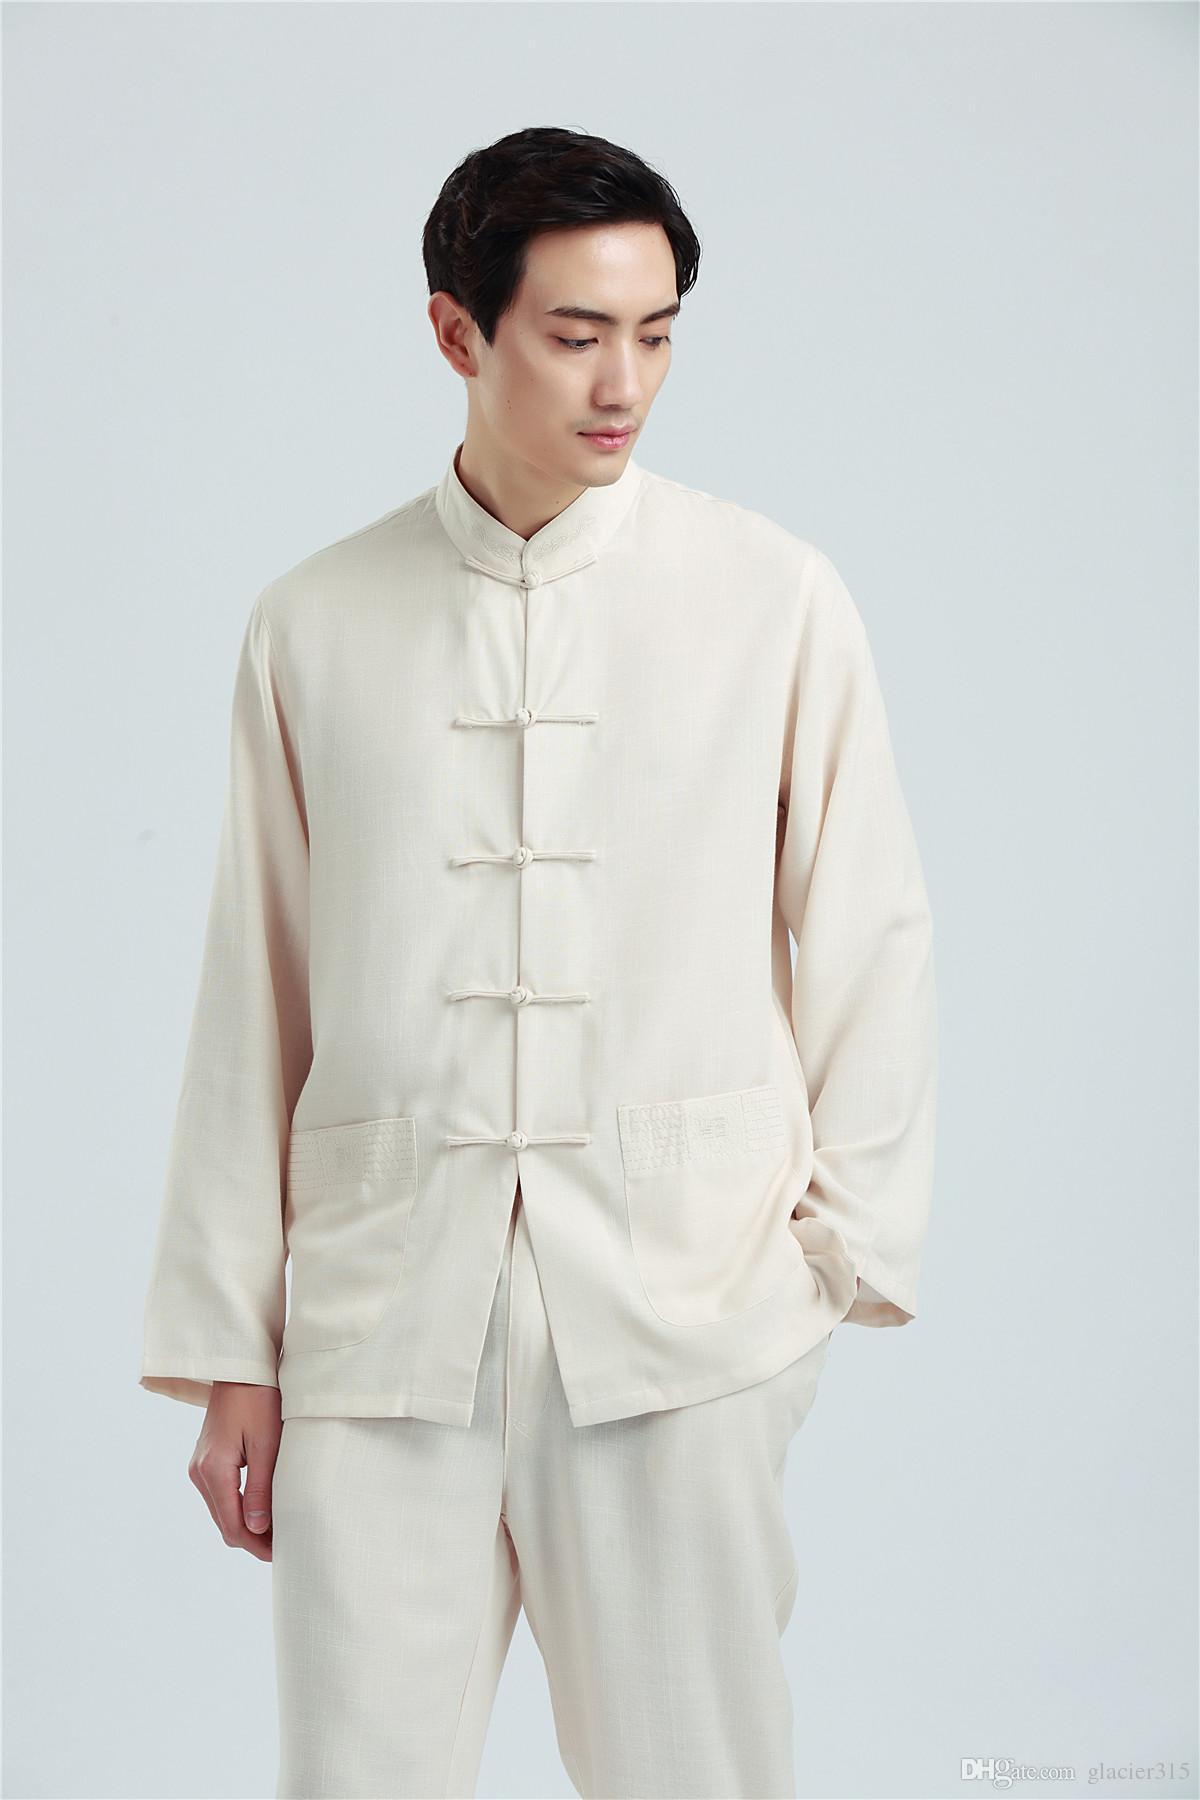 Shanghai Story Martial Arts Shirt For men Tai ji clothing Shirt kungfu Top Linen chinese kung fu Shirt Man Tai Chi CLothes